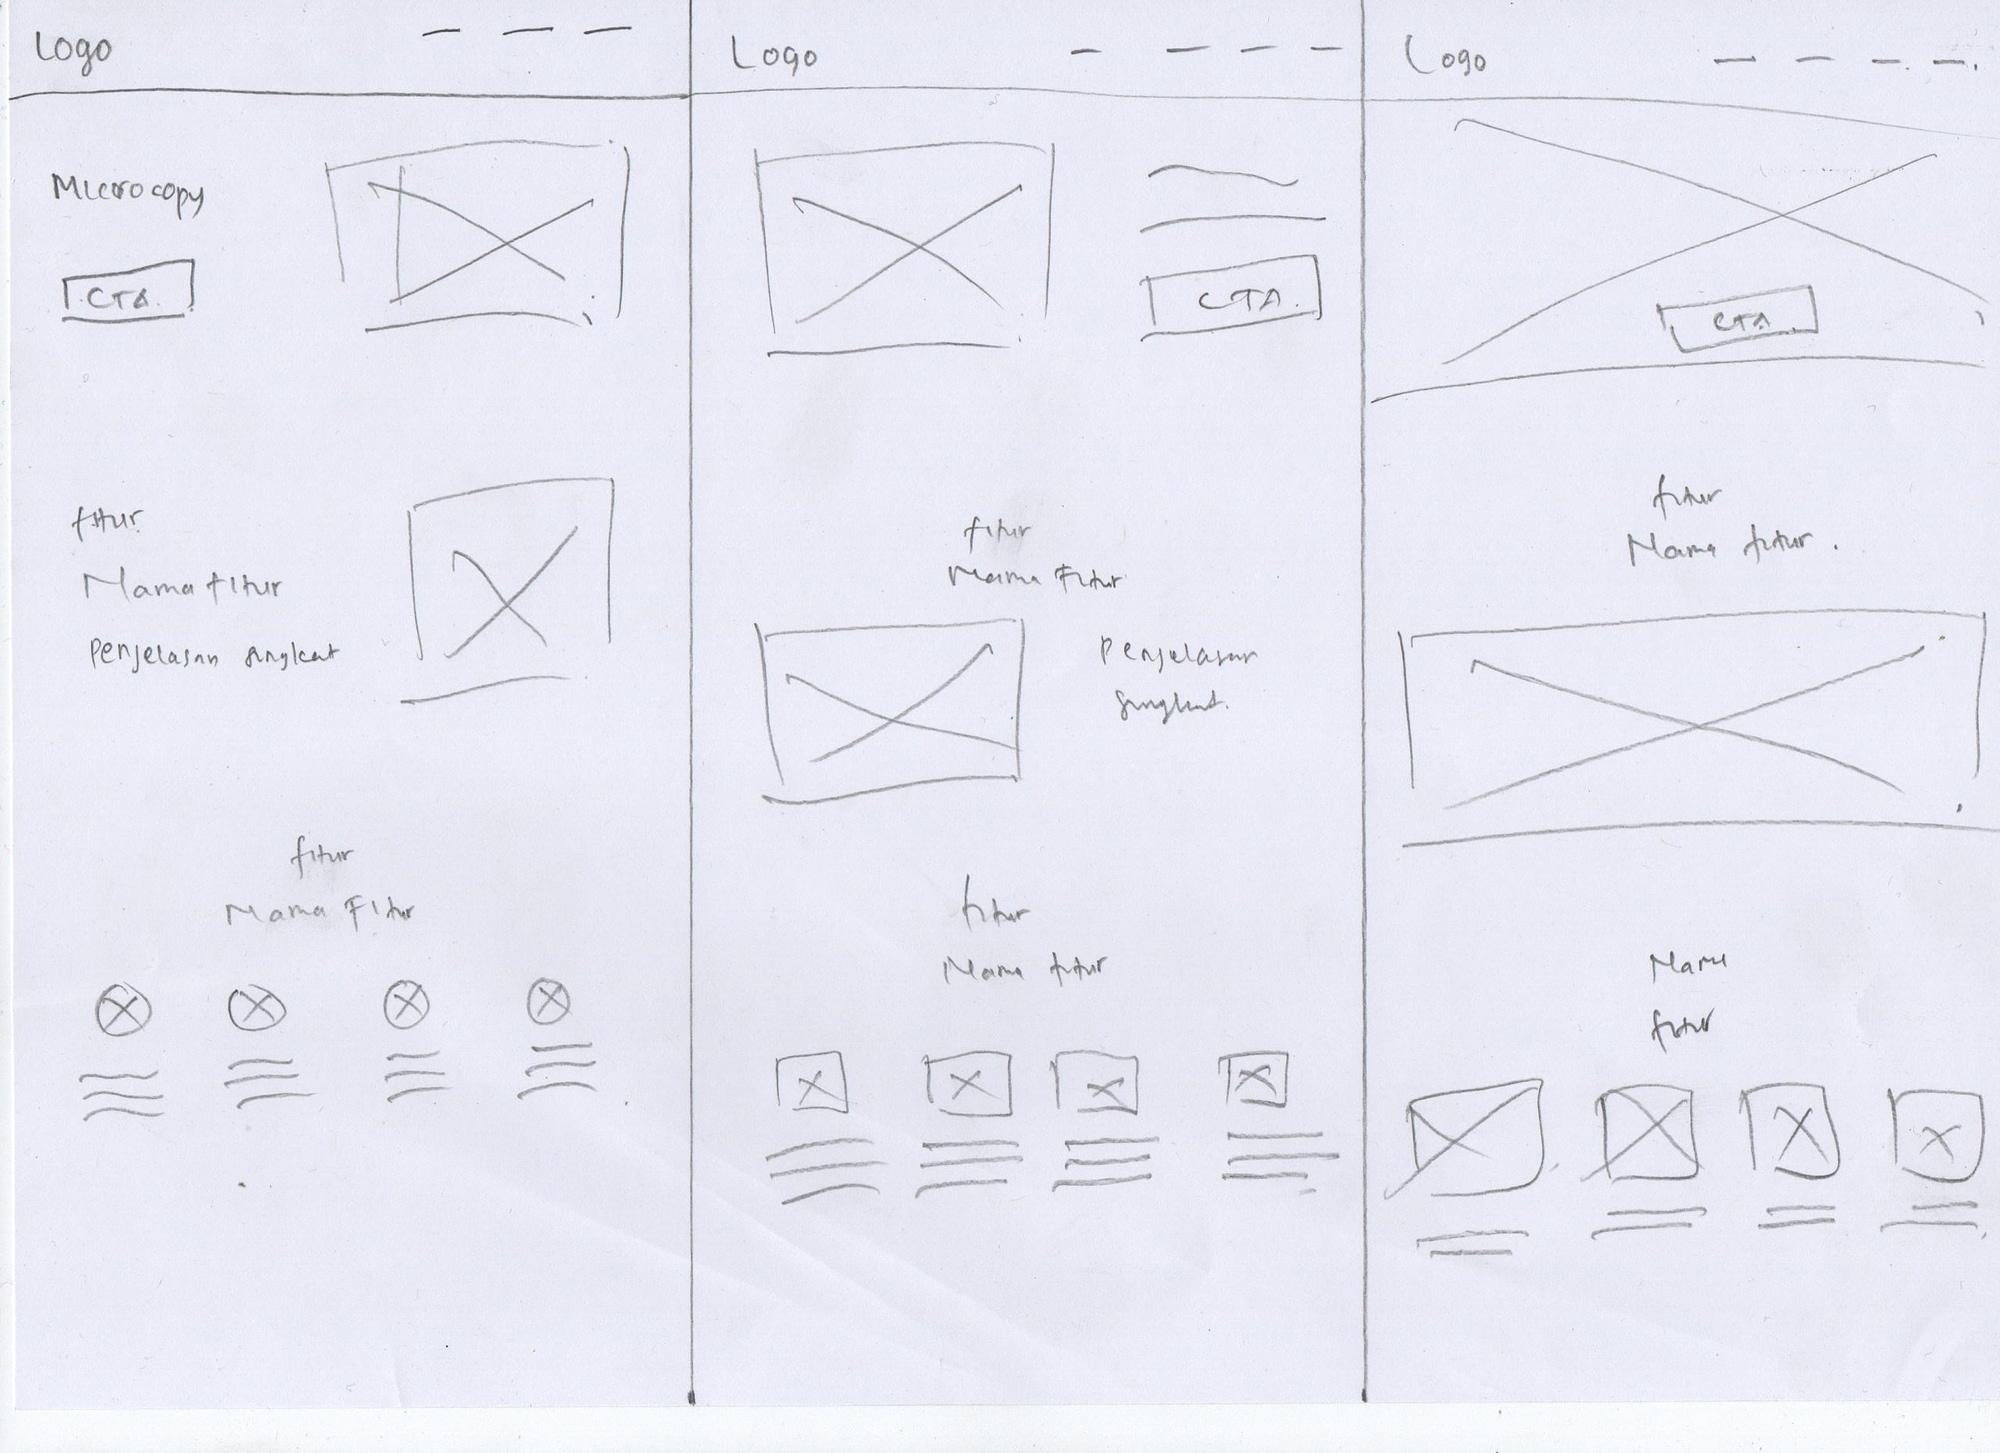 sketsa-layout-sigofast